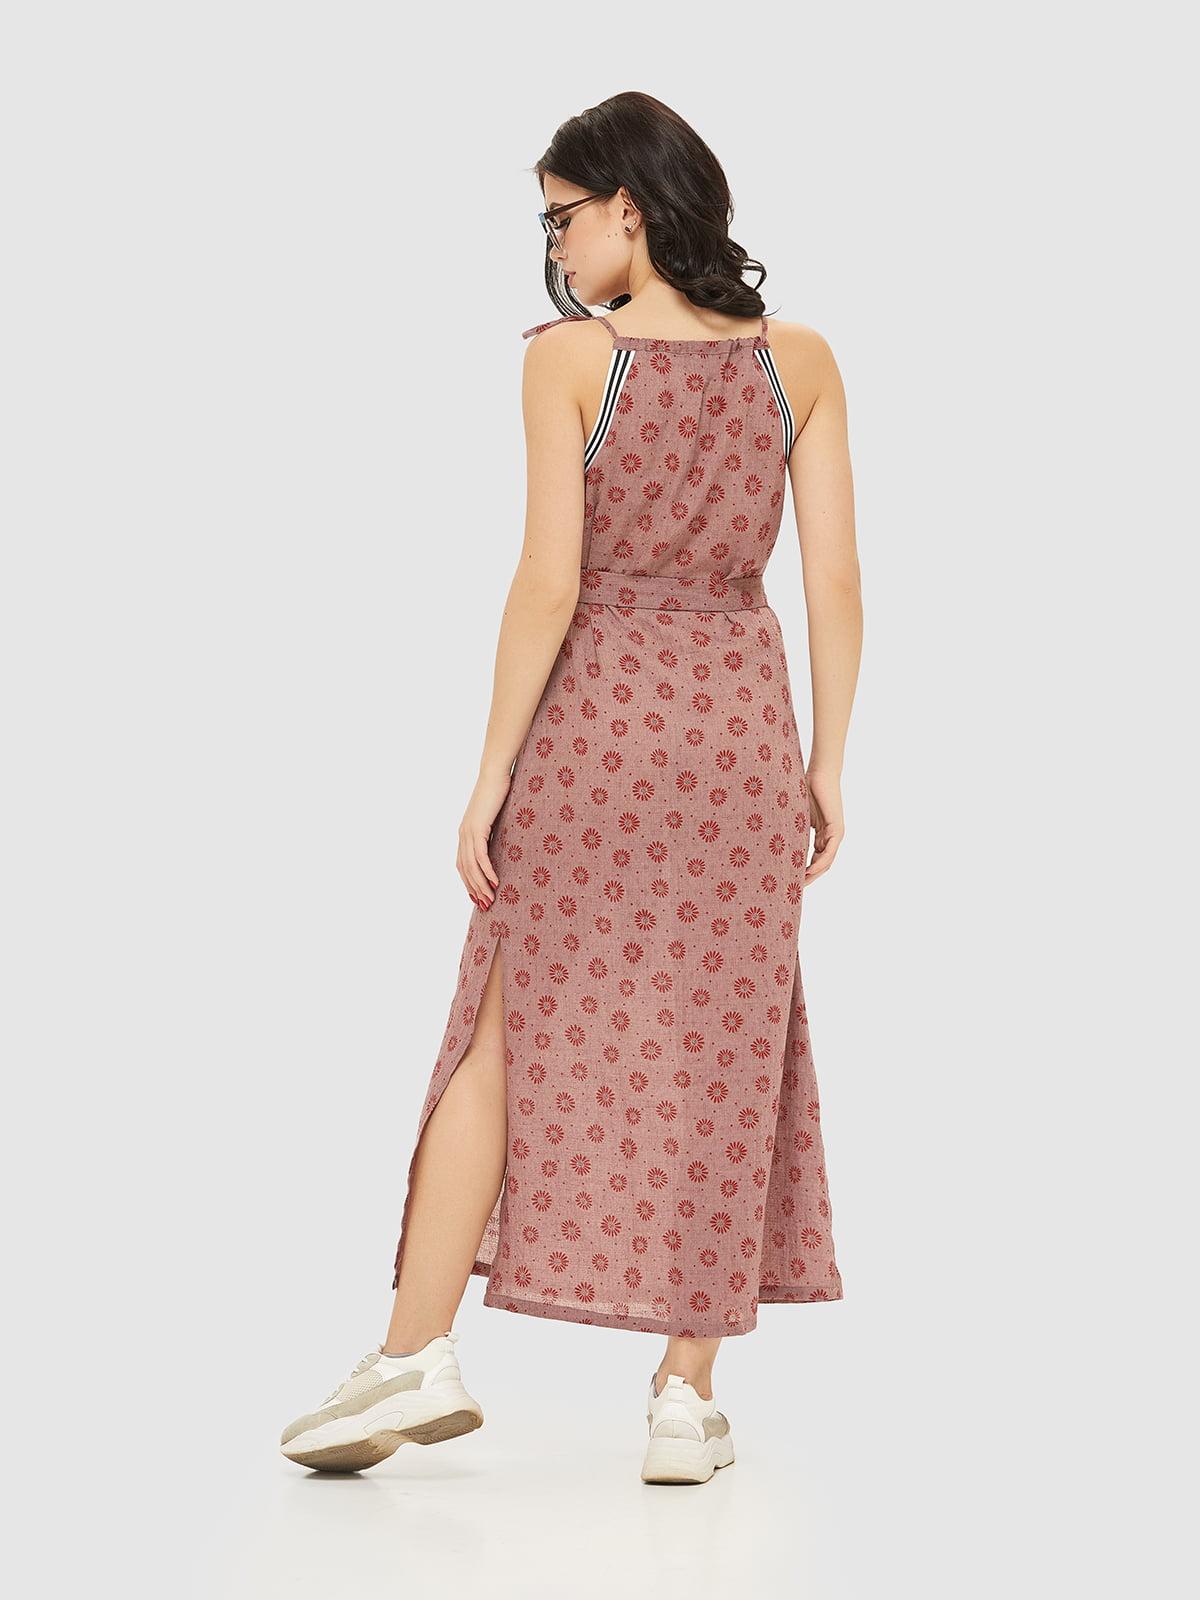 Сукня в принт | 5075490 | фото 2